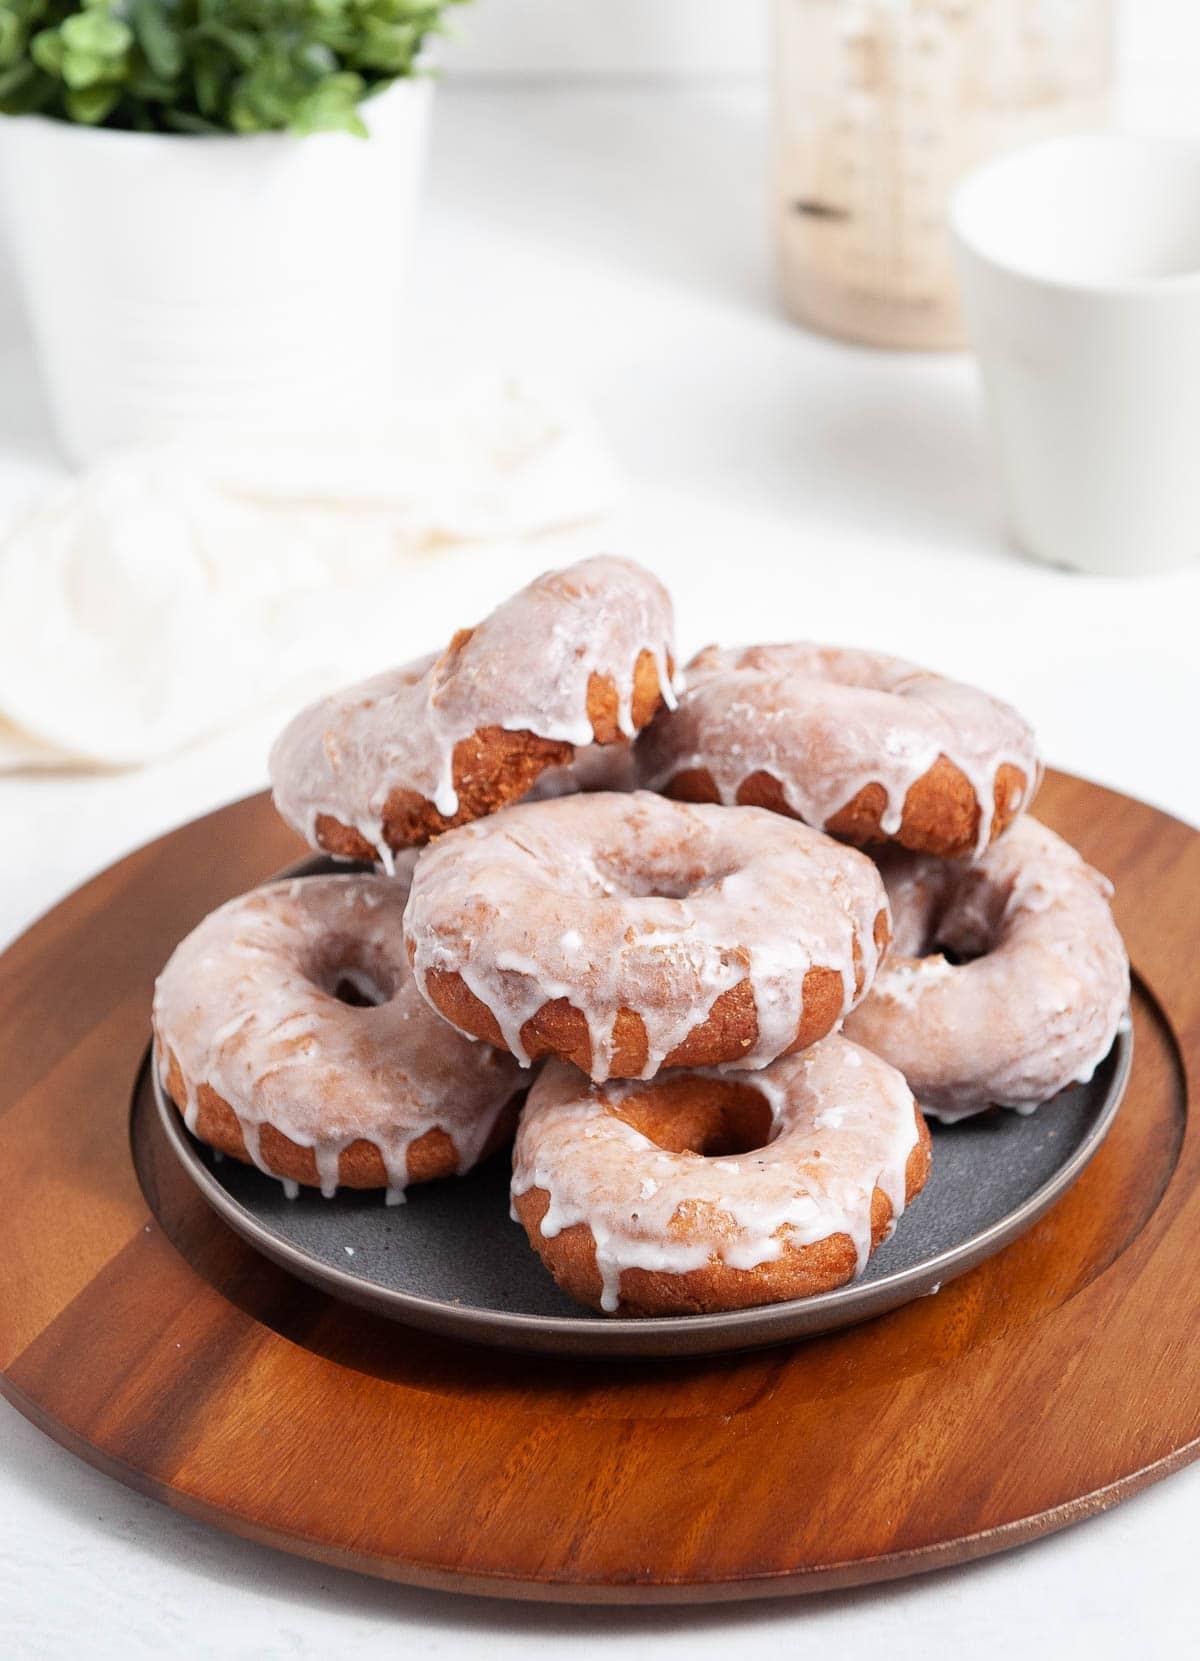 glazed sourdough donuts on a plate